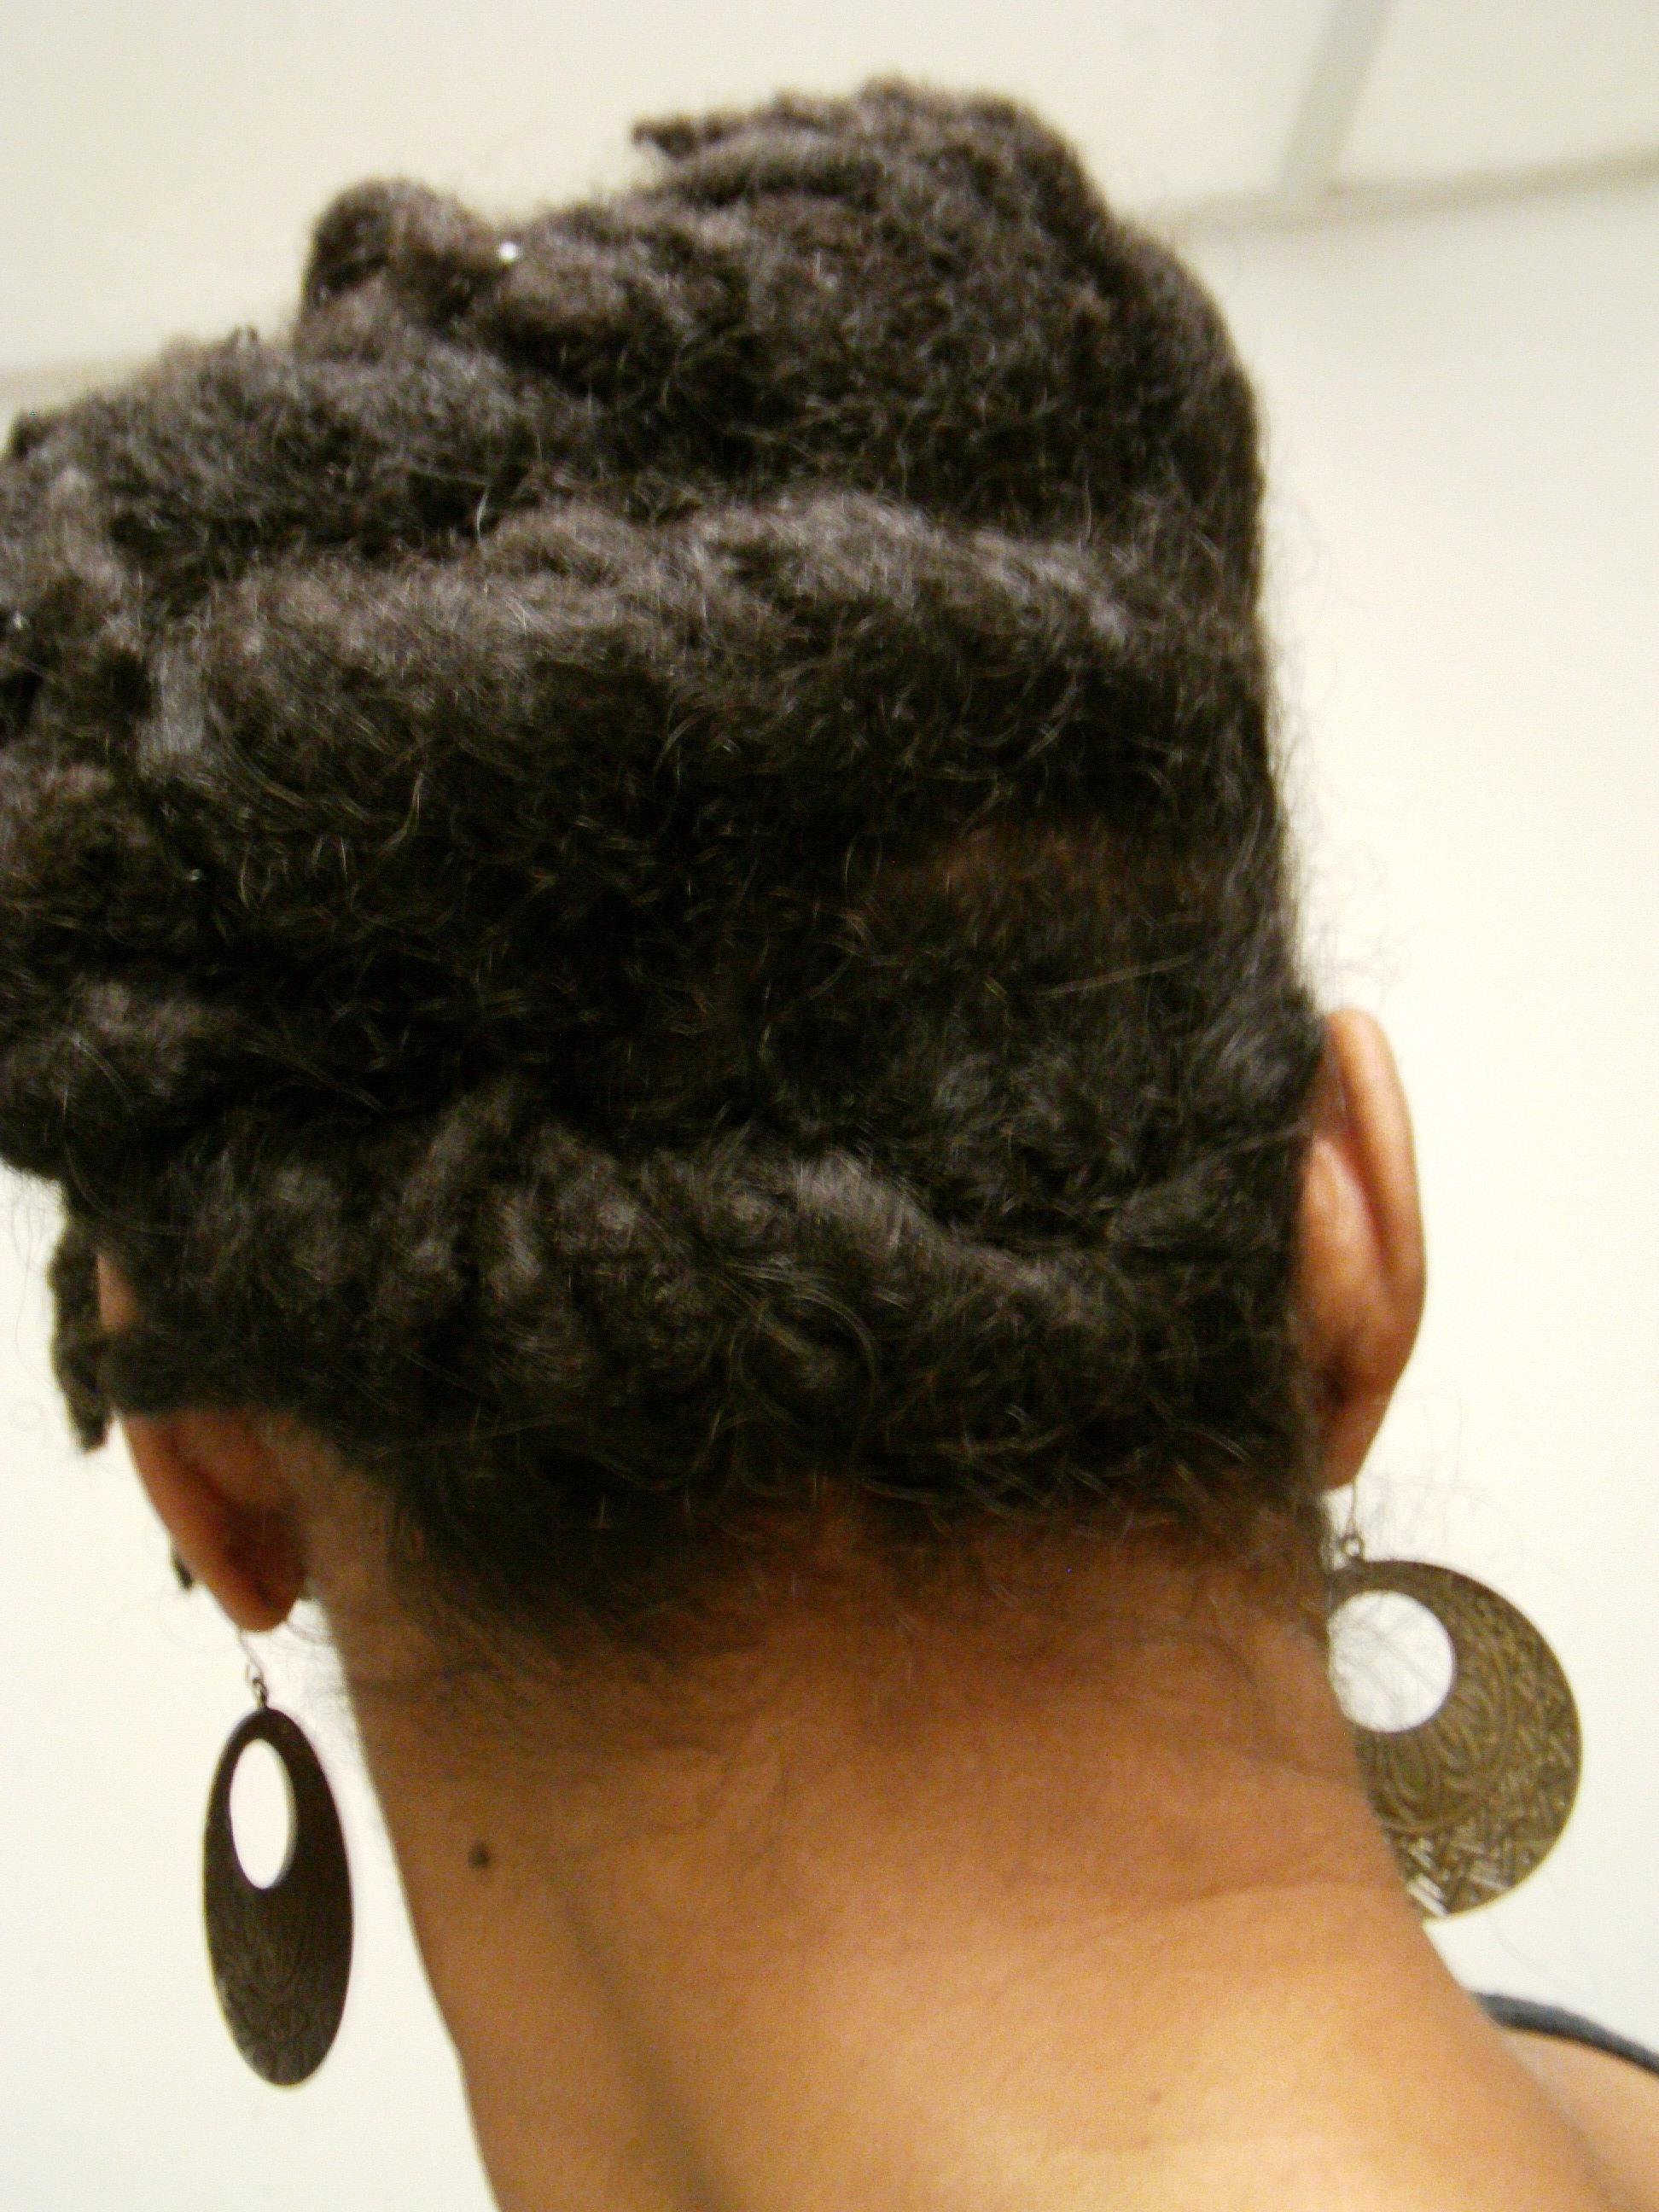 Natural Hairstyles – 1Stop Natural Home Remedies